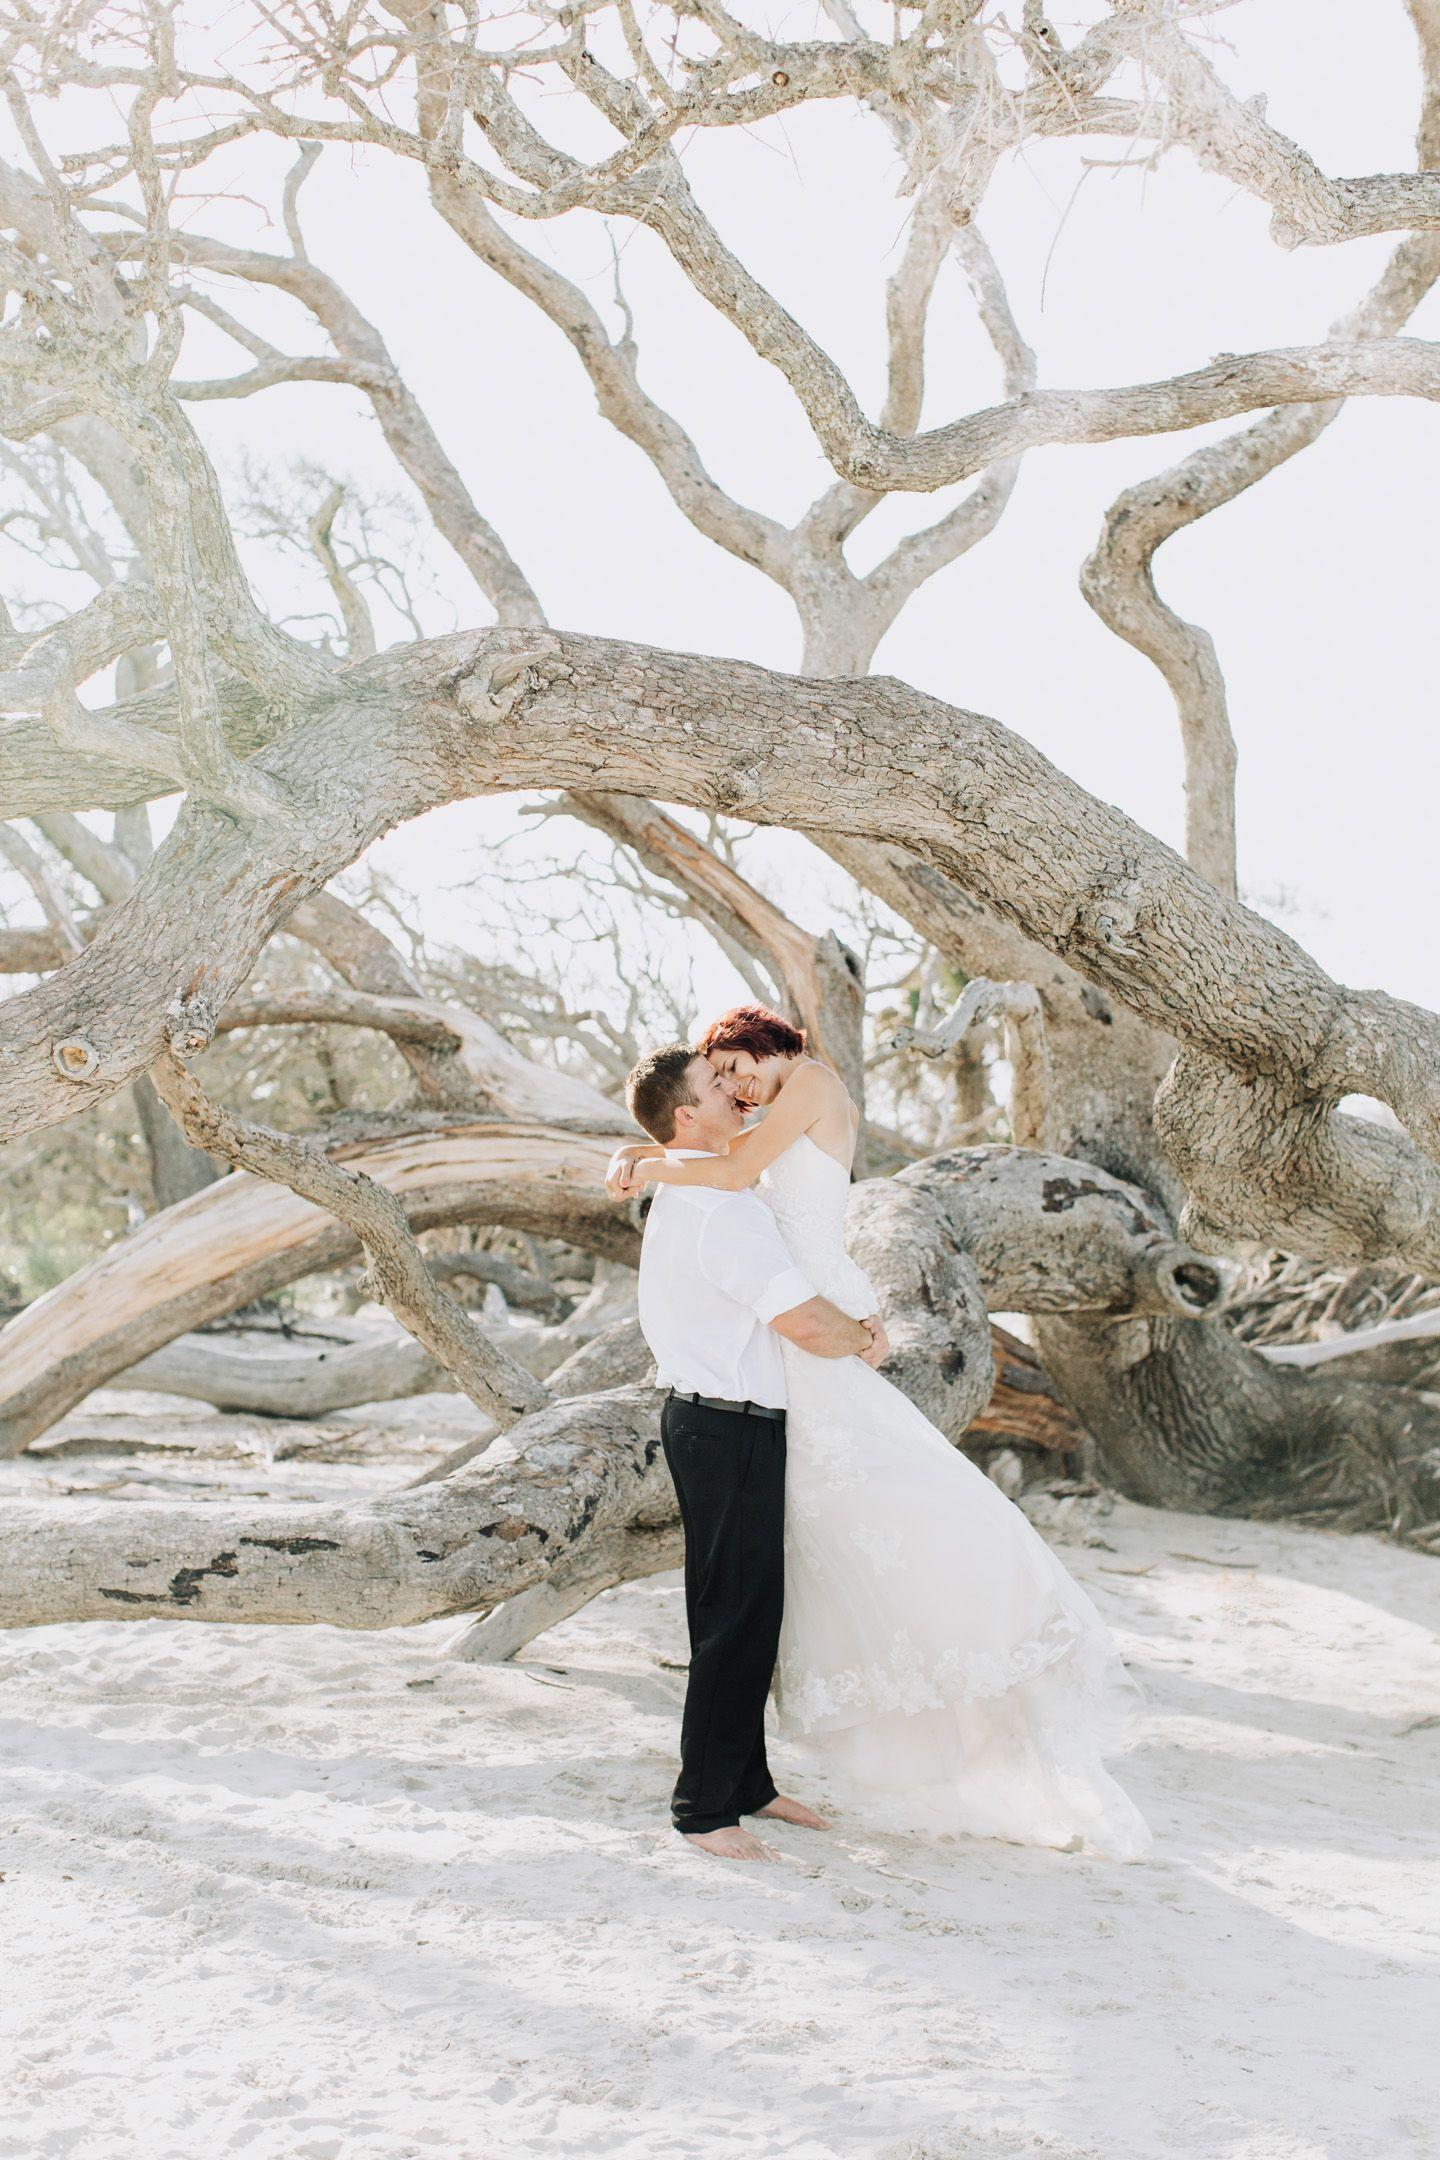 Romantic Driftwood Beach Wedding Photos Beach Wedding Photos Driftwood Wedding Tropical Beach Wedding